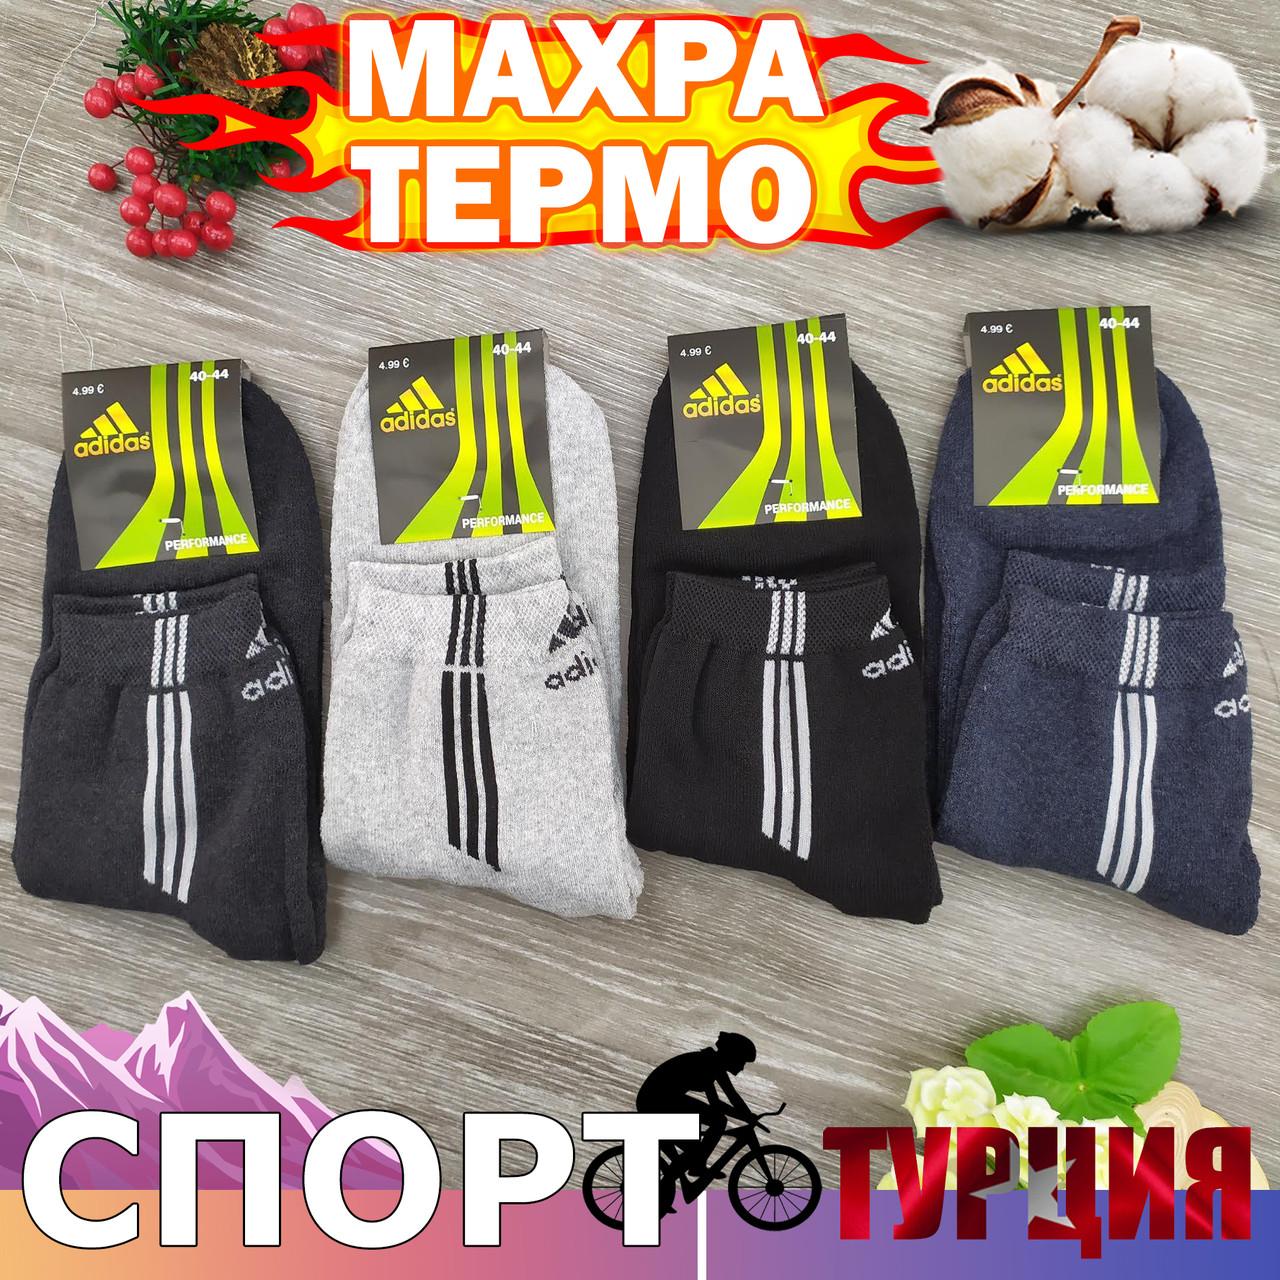 Мужские носки махровые тёплые спорт SPORT A 41-45р ассорти с белым НМЗ-040435